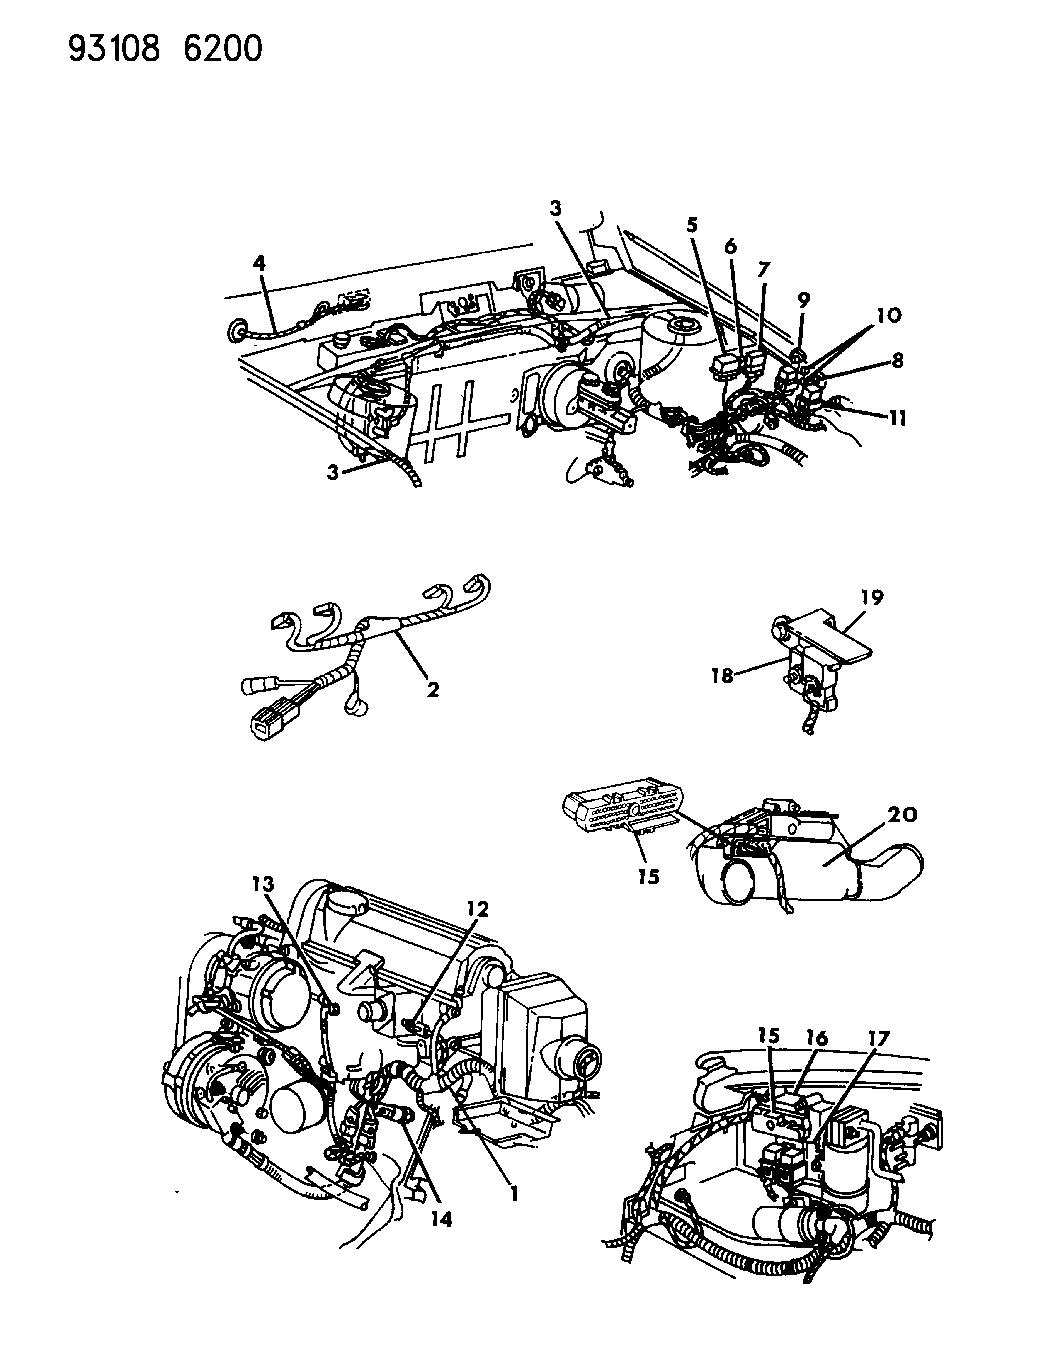 1993 Dodge Spirit Wiring Diagram